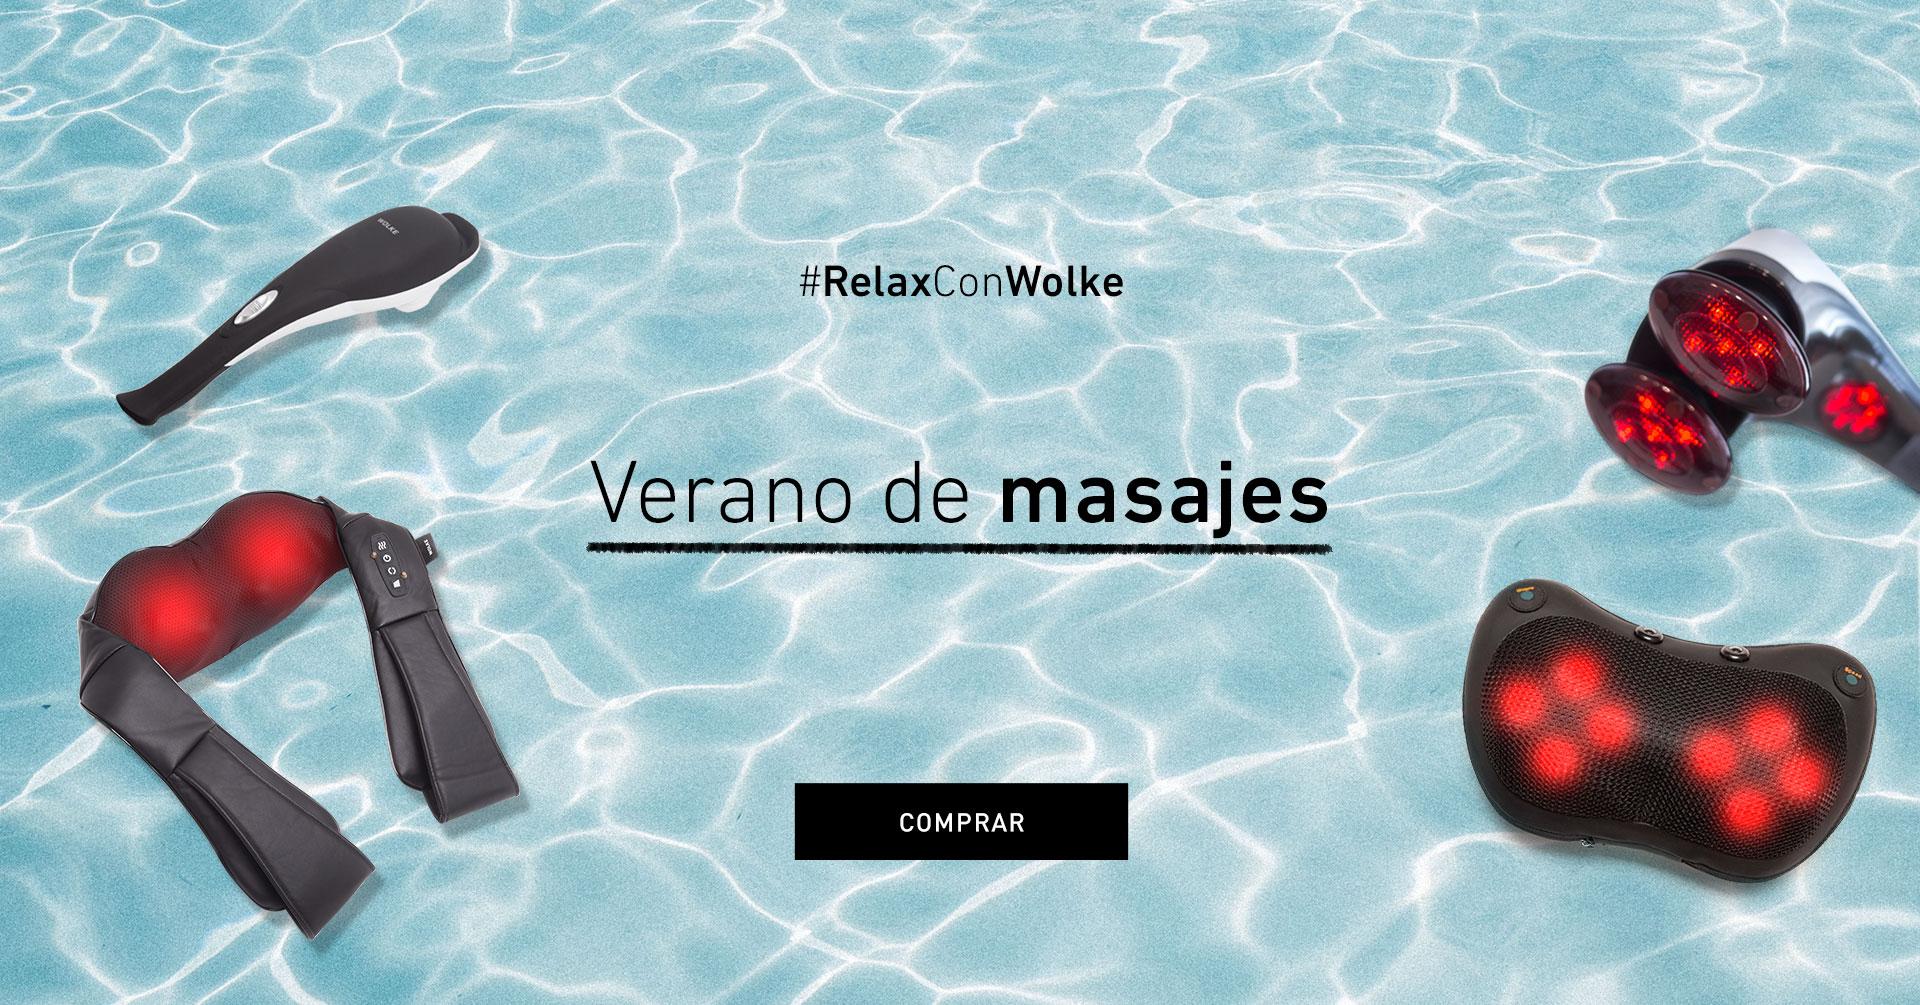 RelaxConWolke